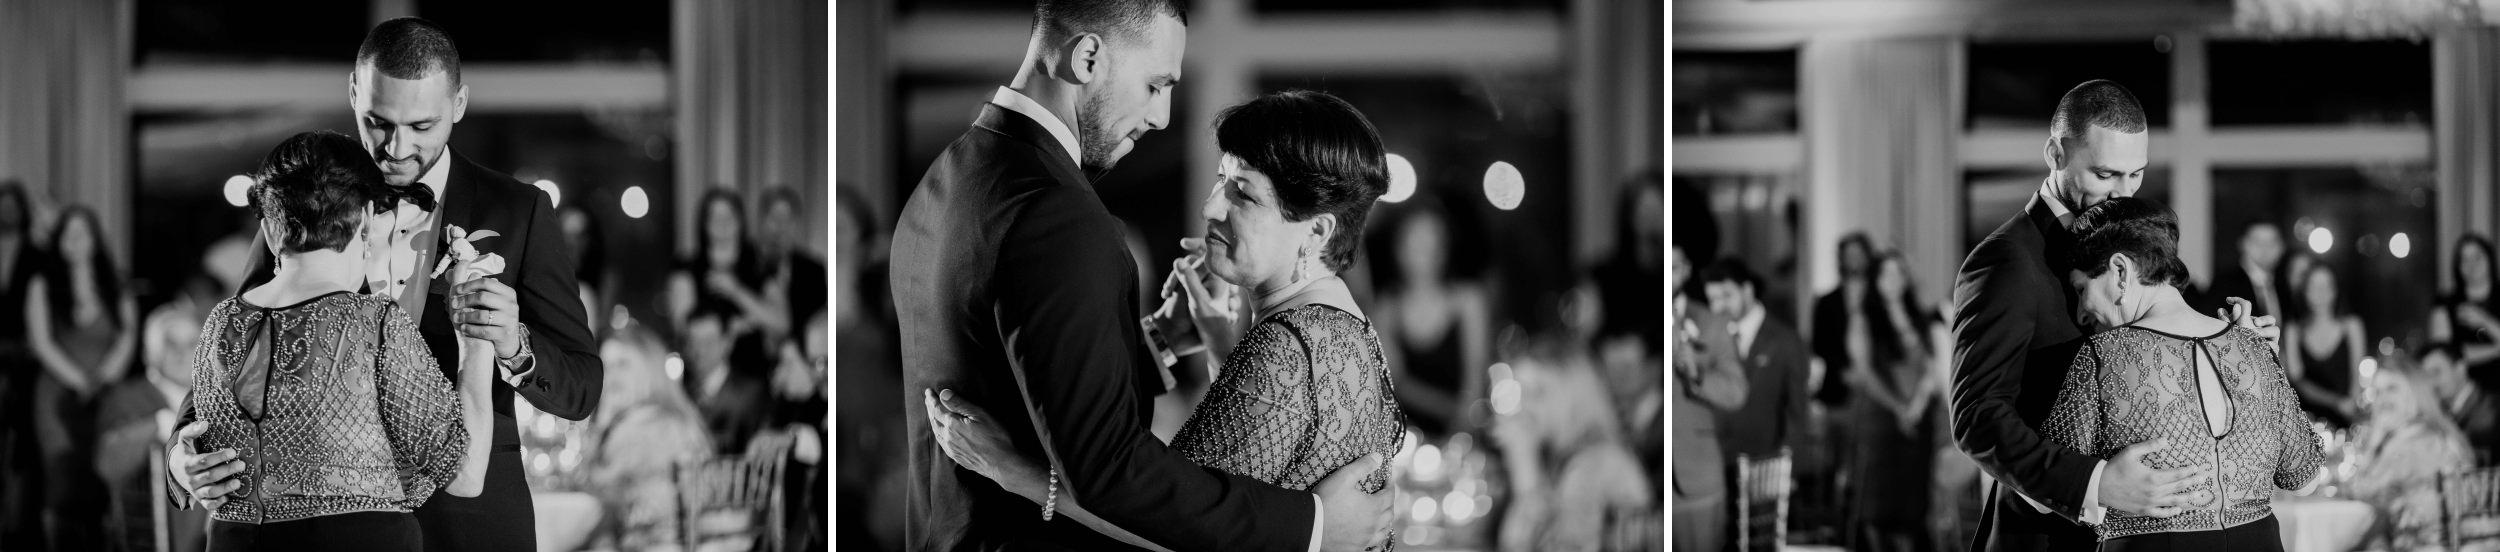 Wedding - Rusty Pelican - Key Biscayne - Santy Martinez Photography 40.jpg